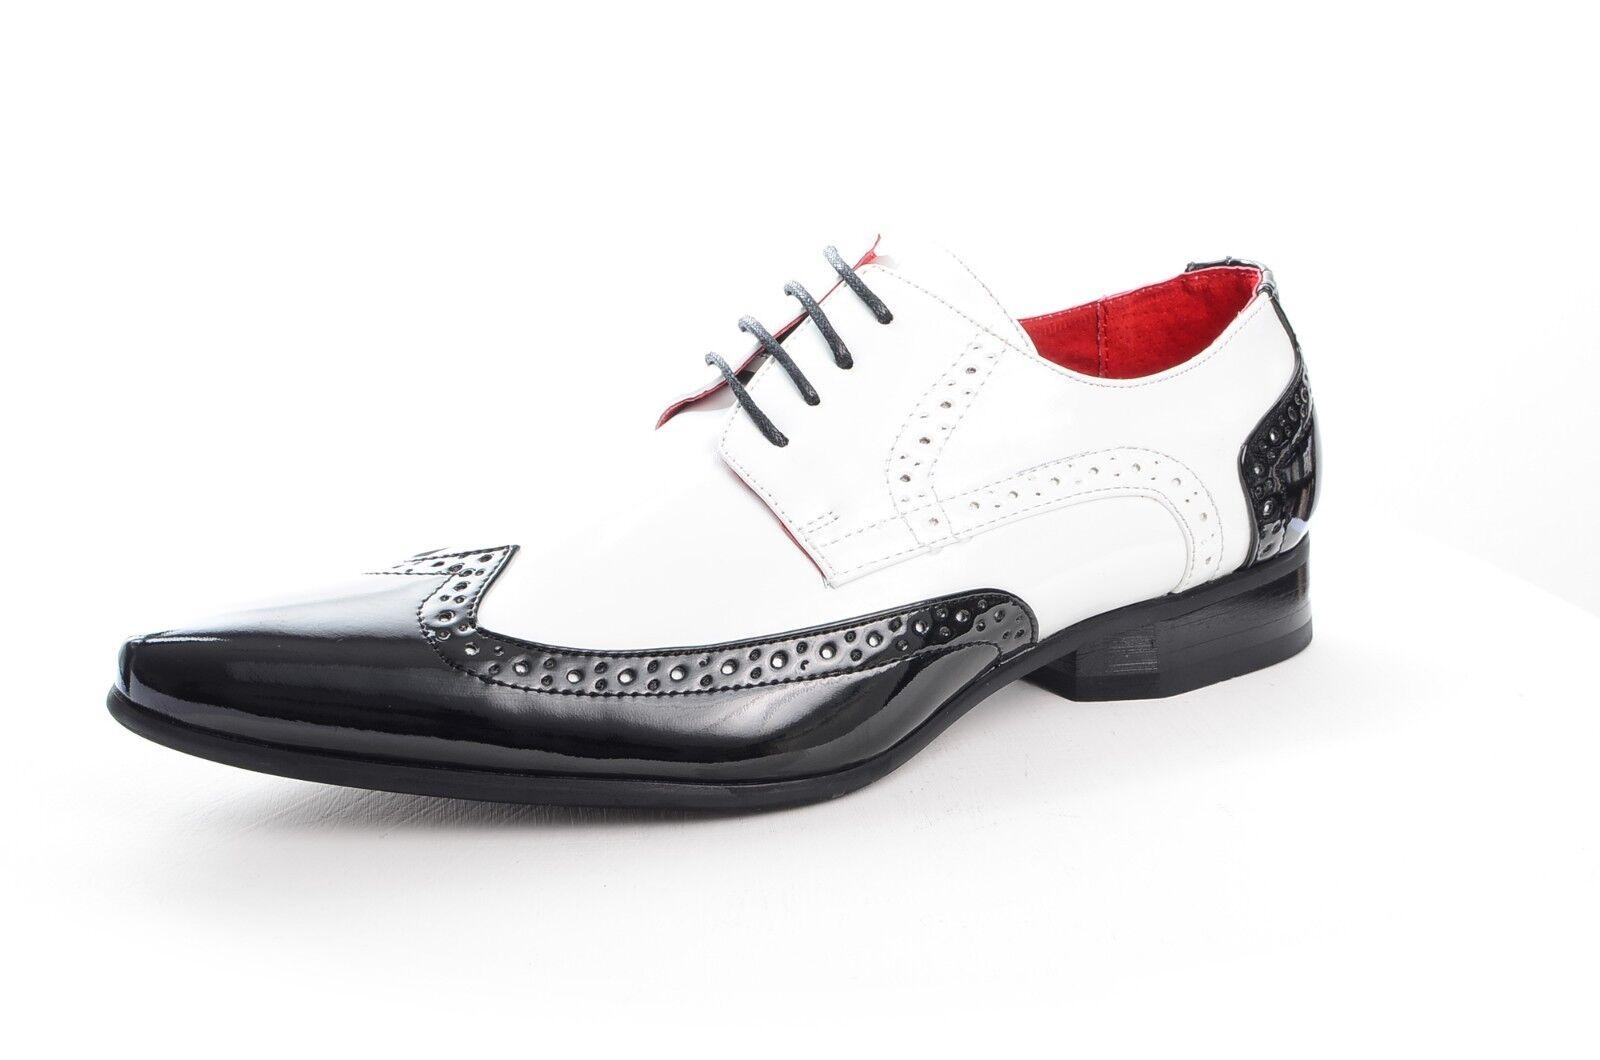 Mens Brogue Spat Dress Party Gangster Lace up Patent shoes Black White Size 7